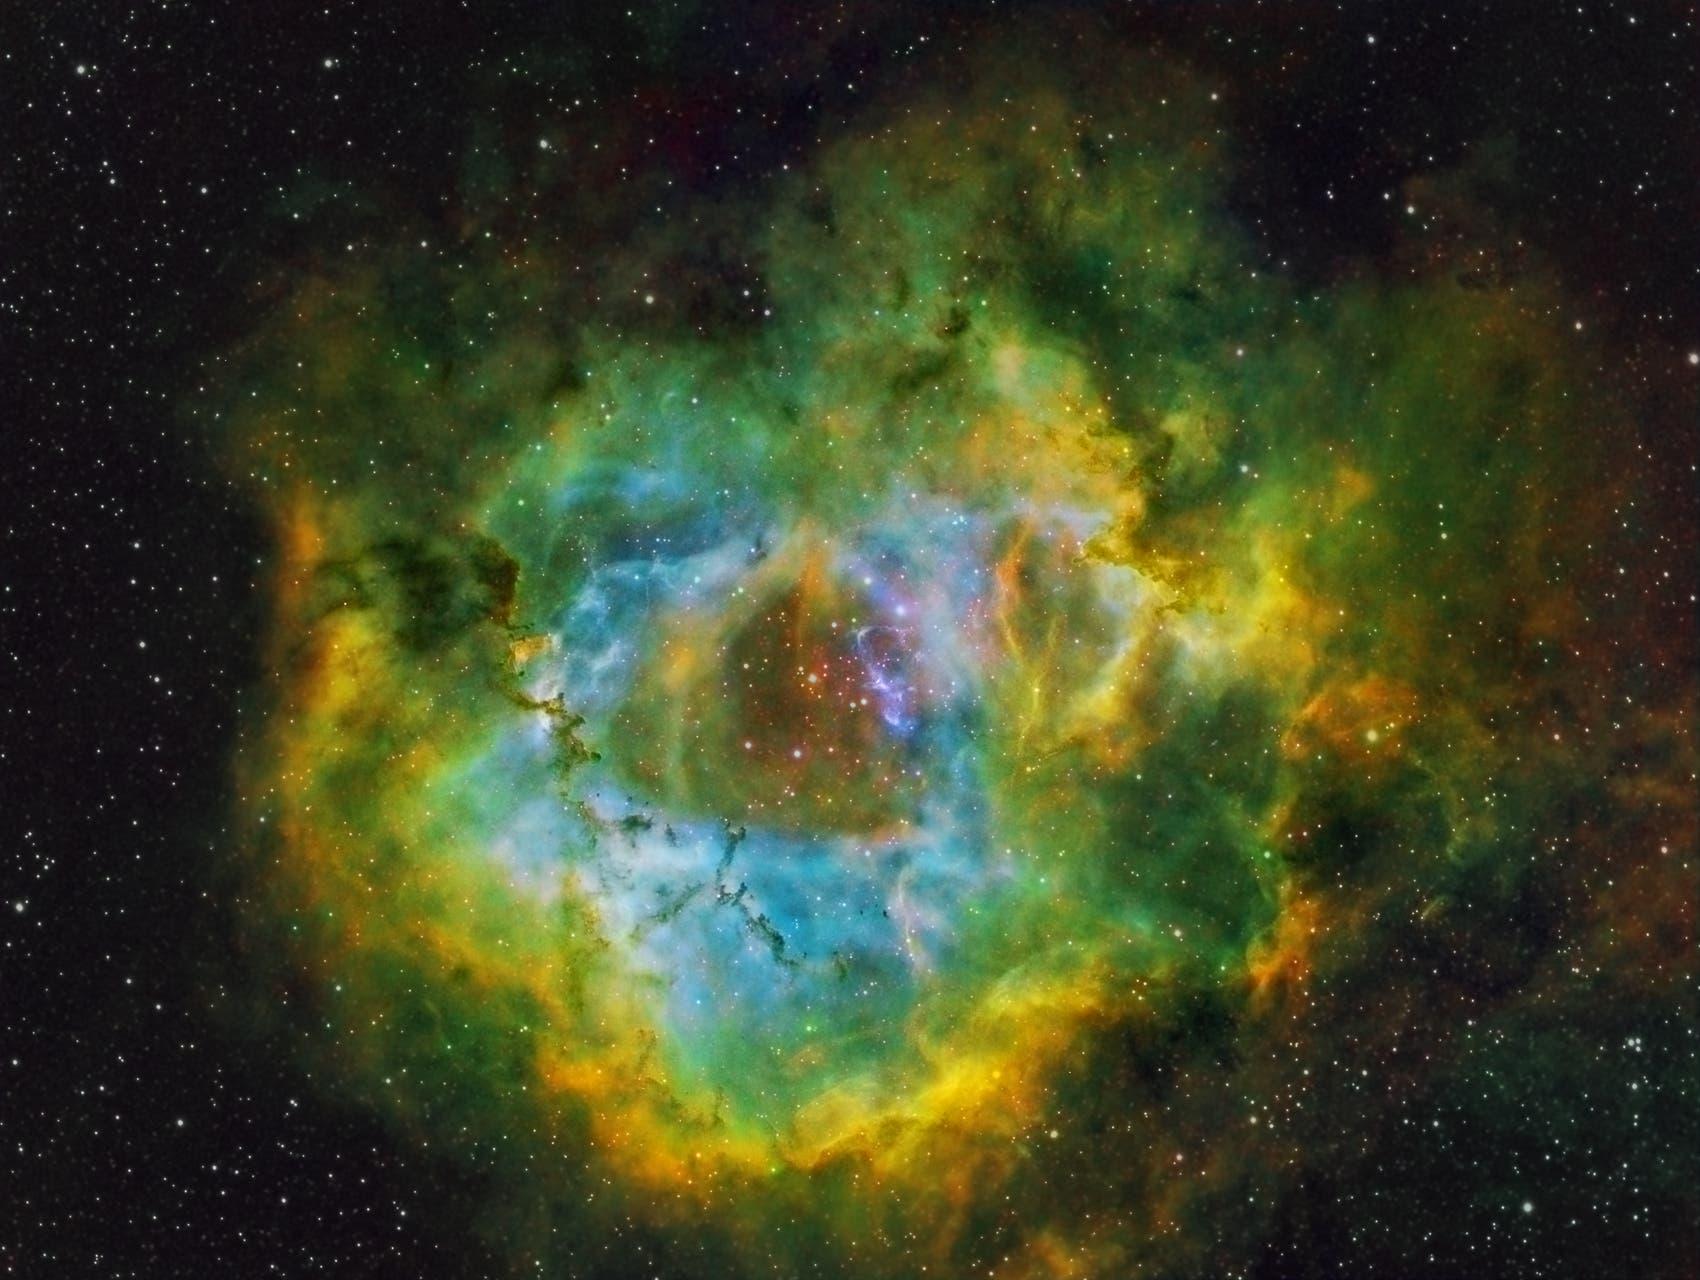 NGC 2244 Rosettennebel in Hubble-Farben-Tonemapping